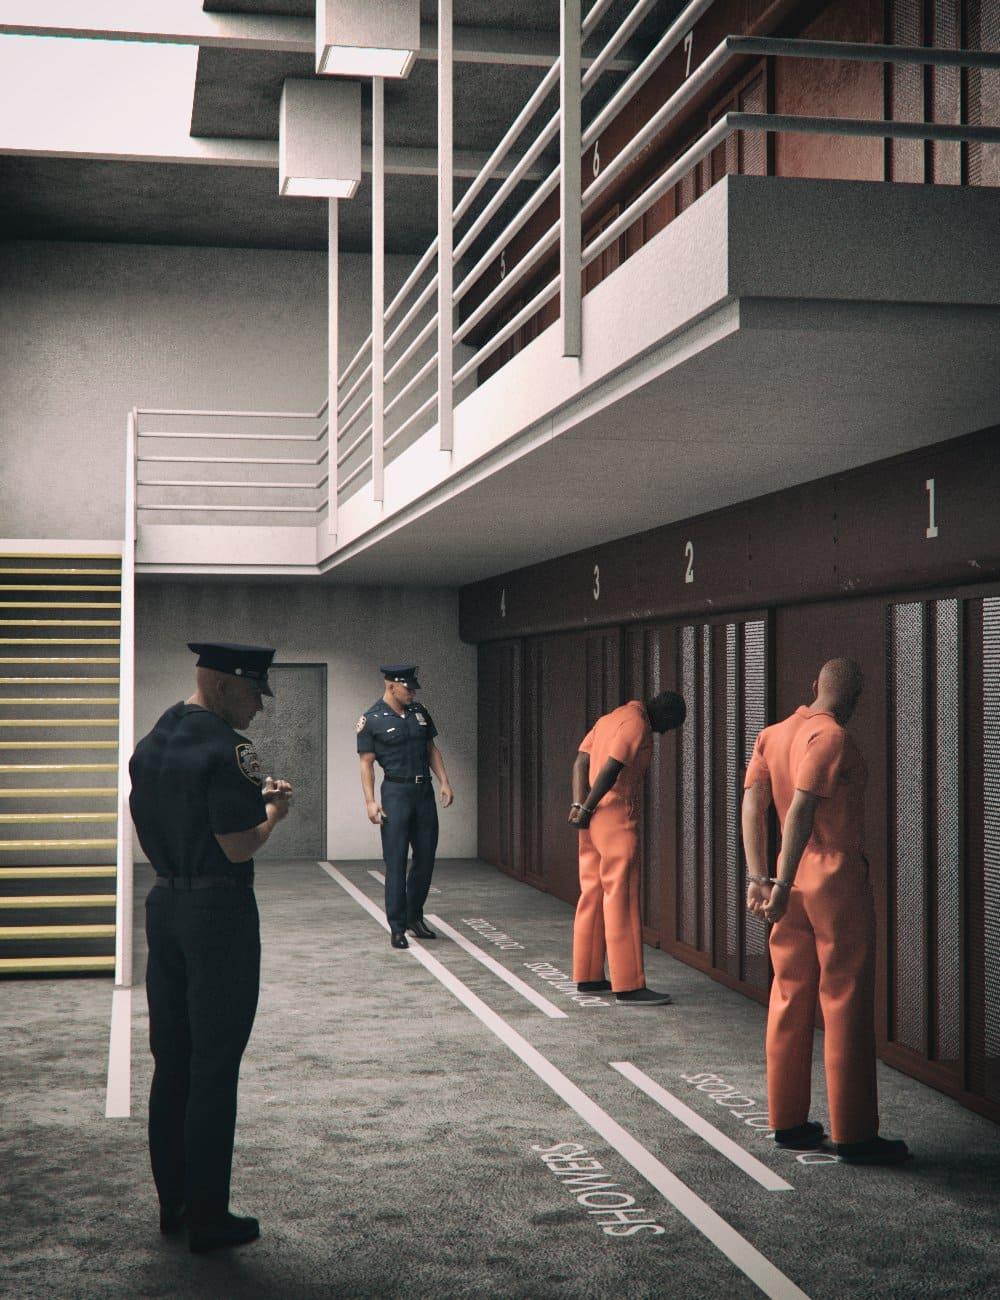 High Security Prison_DAZ3D下载站